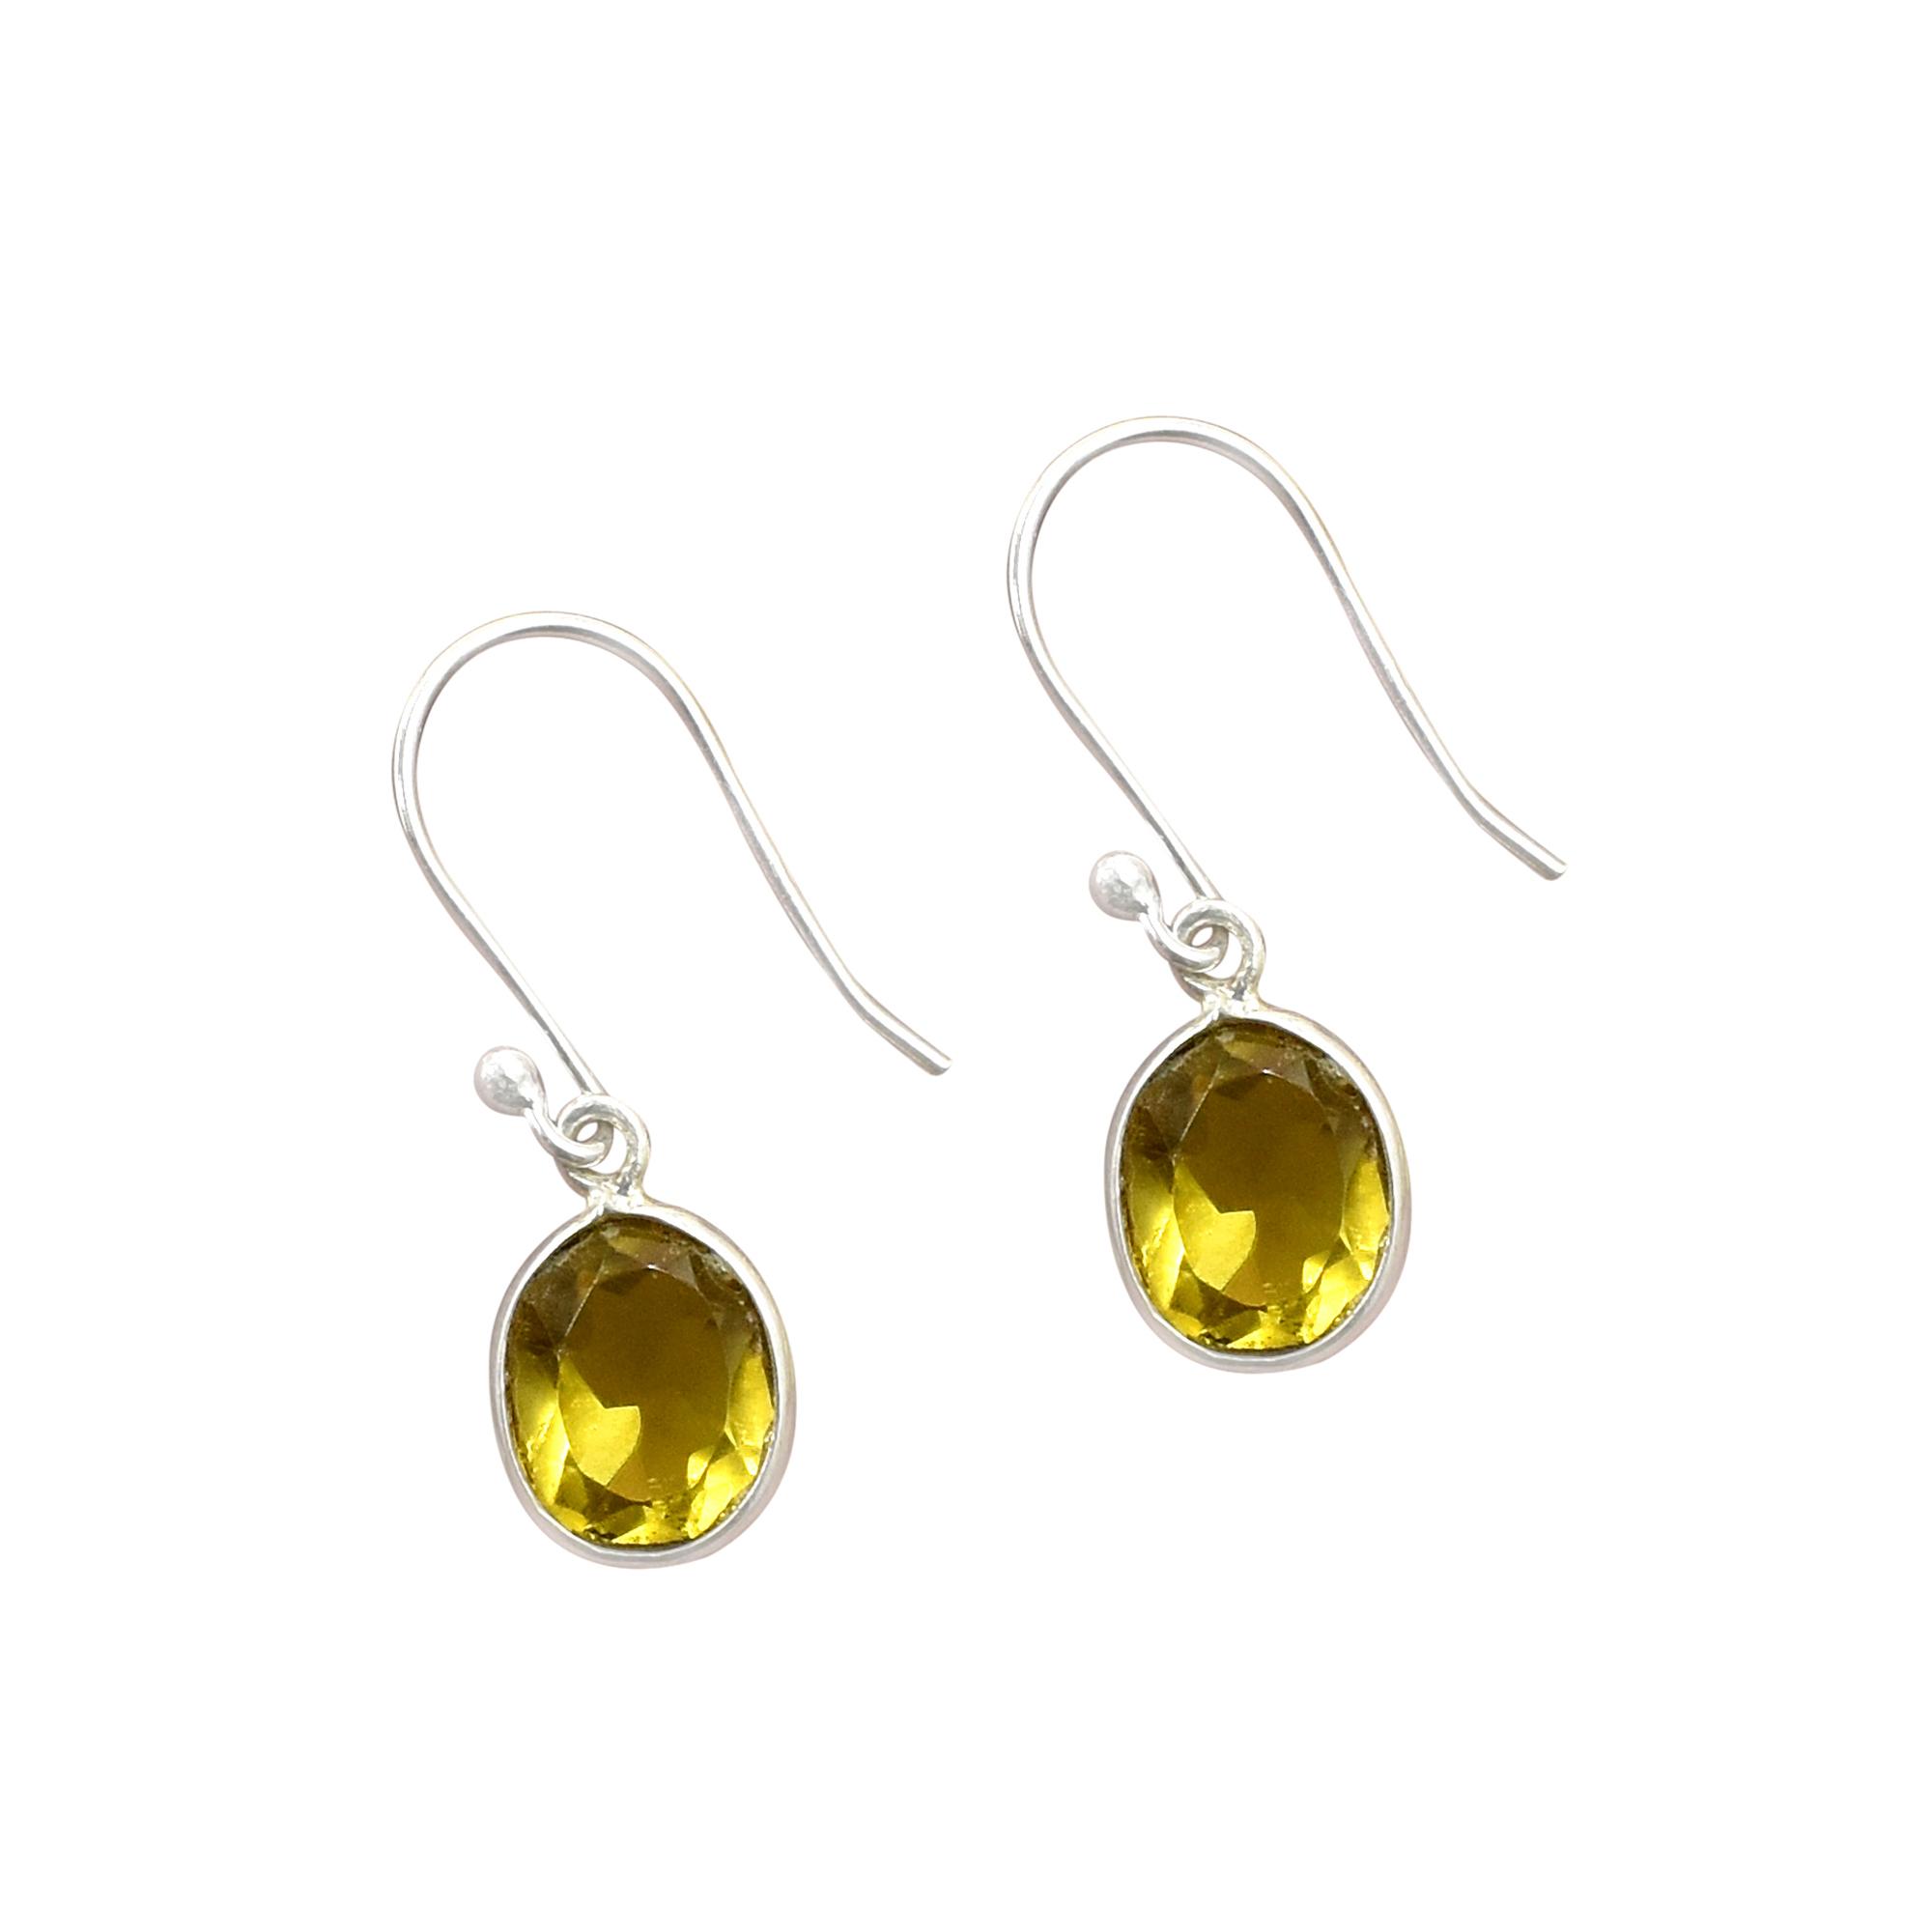 Silvesto India Natural Citrine Quartz Gemstone Earring 925 Sterling Silver Dangle Drop Fashion Earring